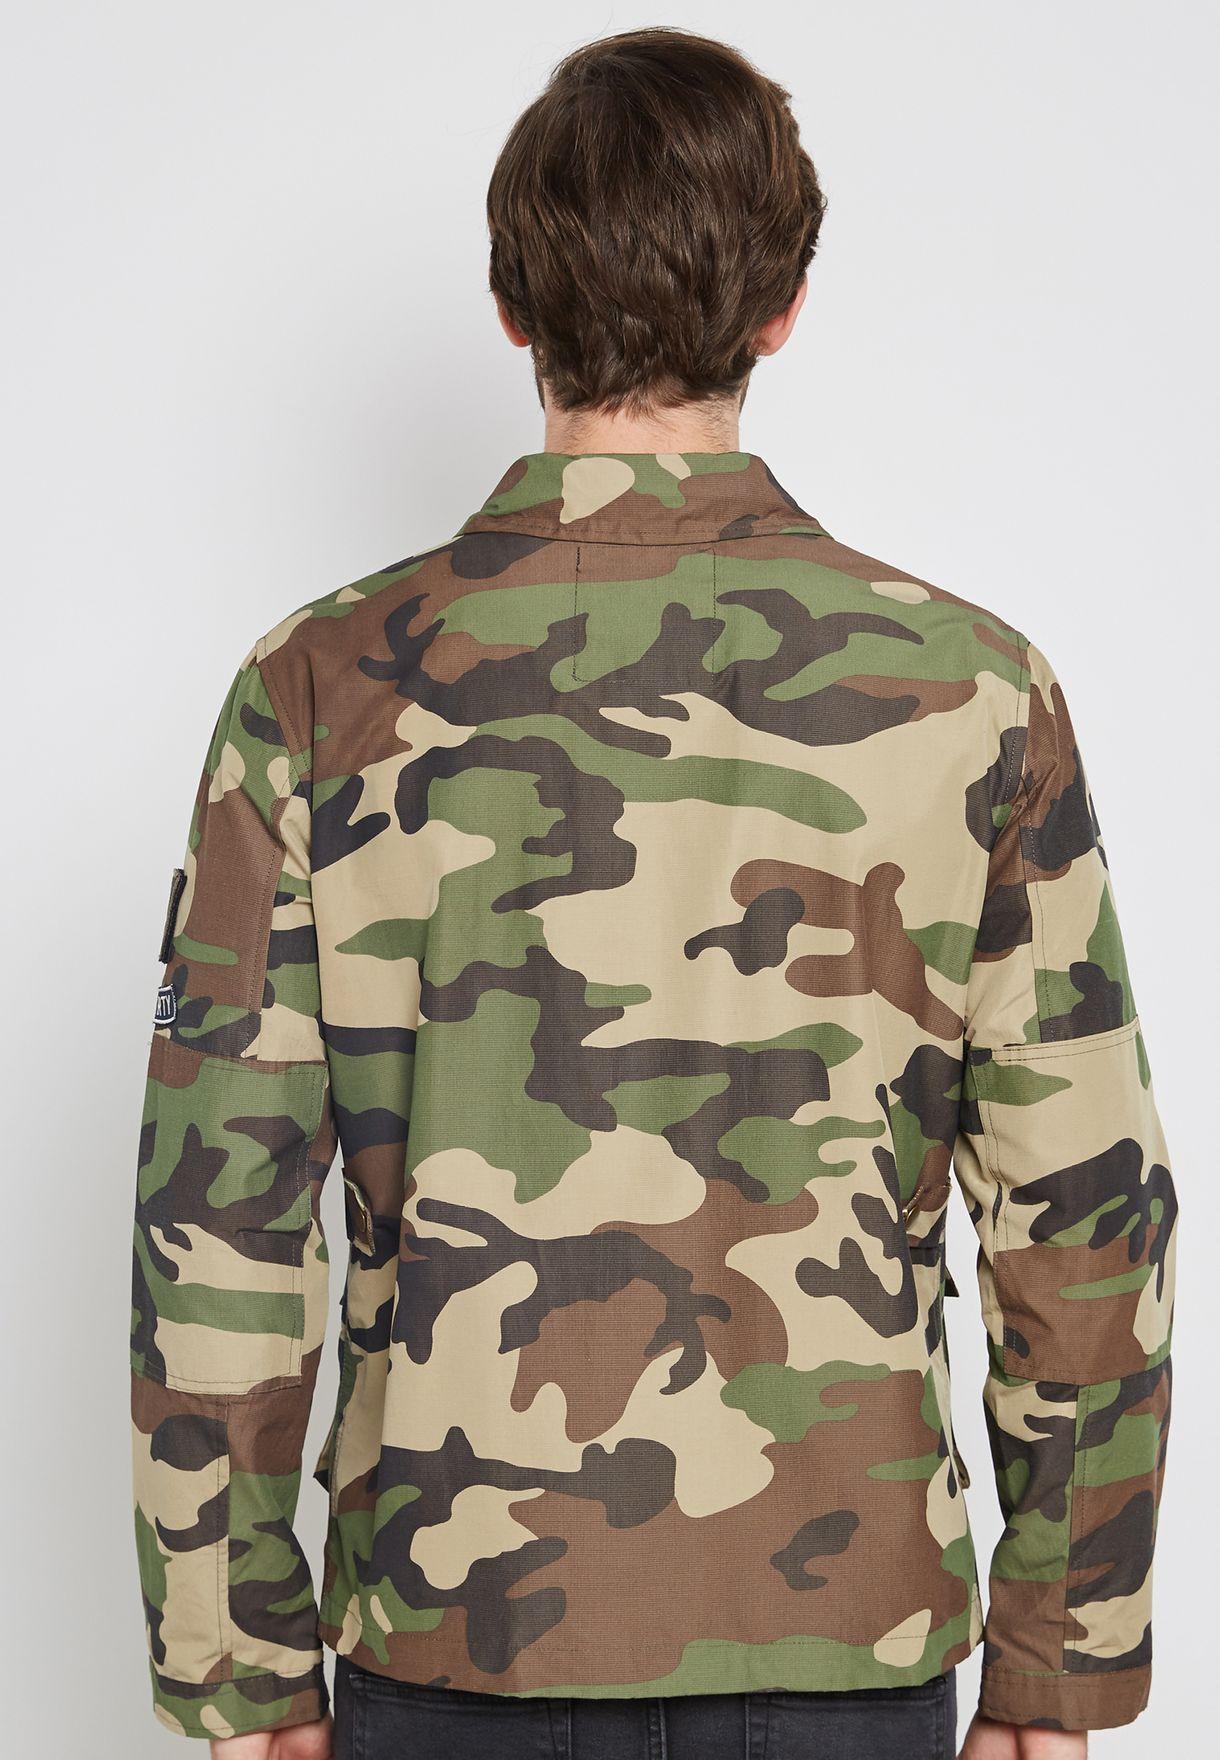 Crette Camo Jacket